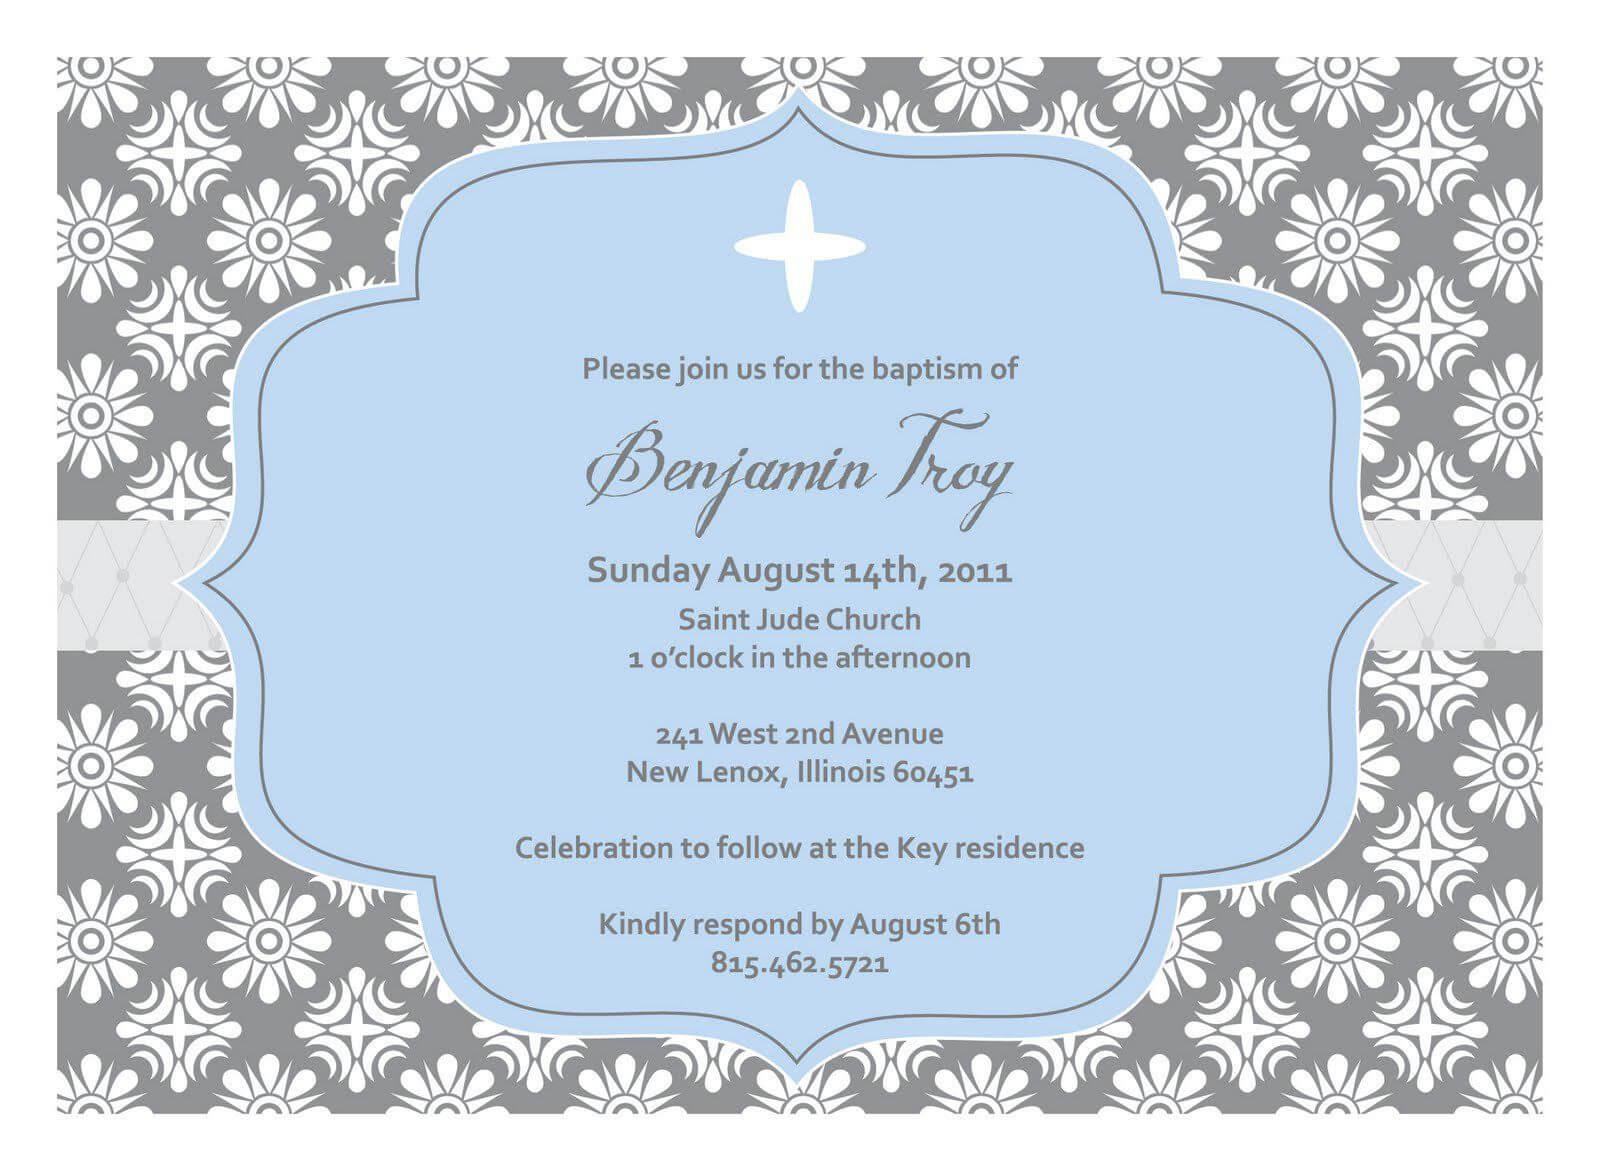 Christening-Invitation-Blank-Template   Baptism Invitations intended for Blank Christening Invitation Templates